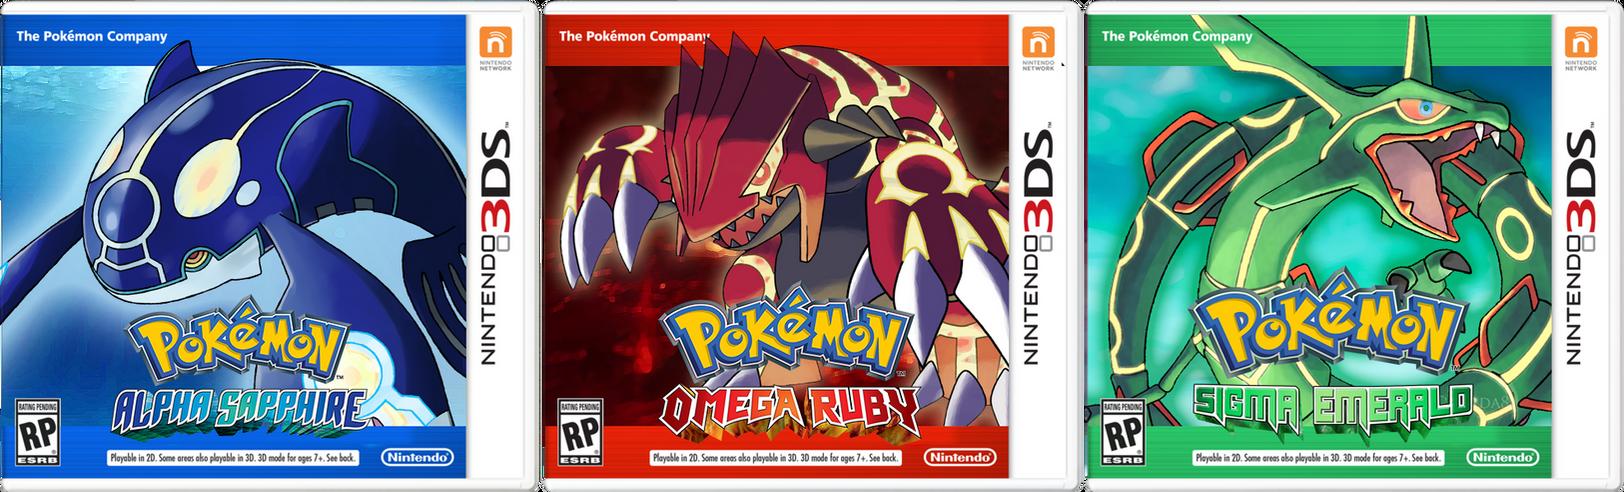 Pokemon Omega Ruby Alpha Sapphire Sigma Emerald by Deko-kun